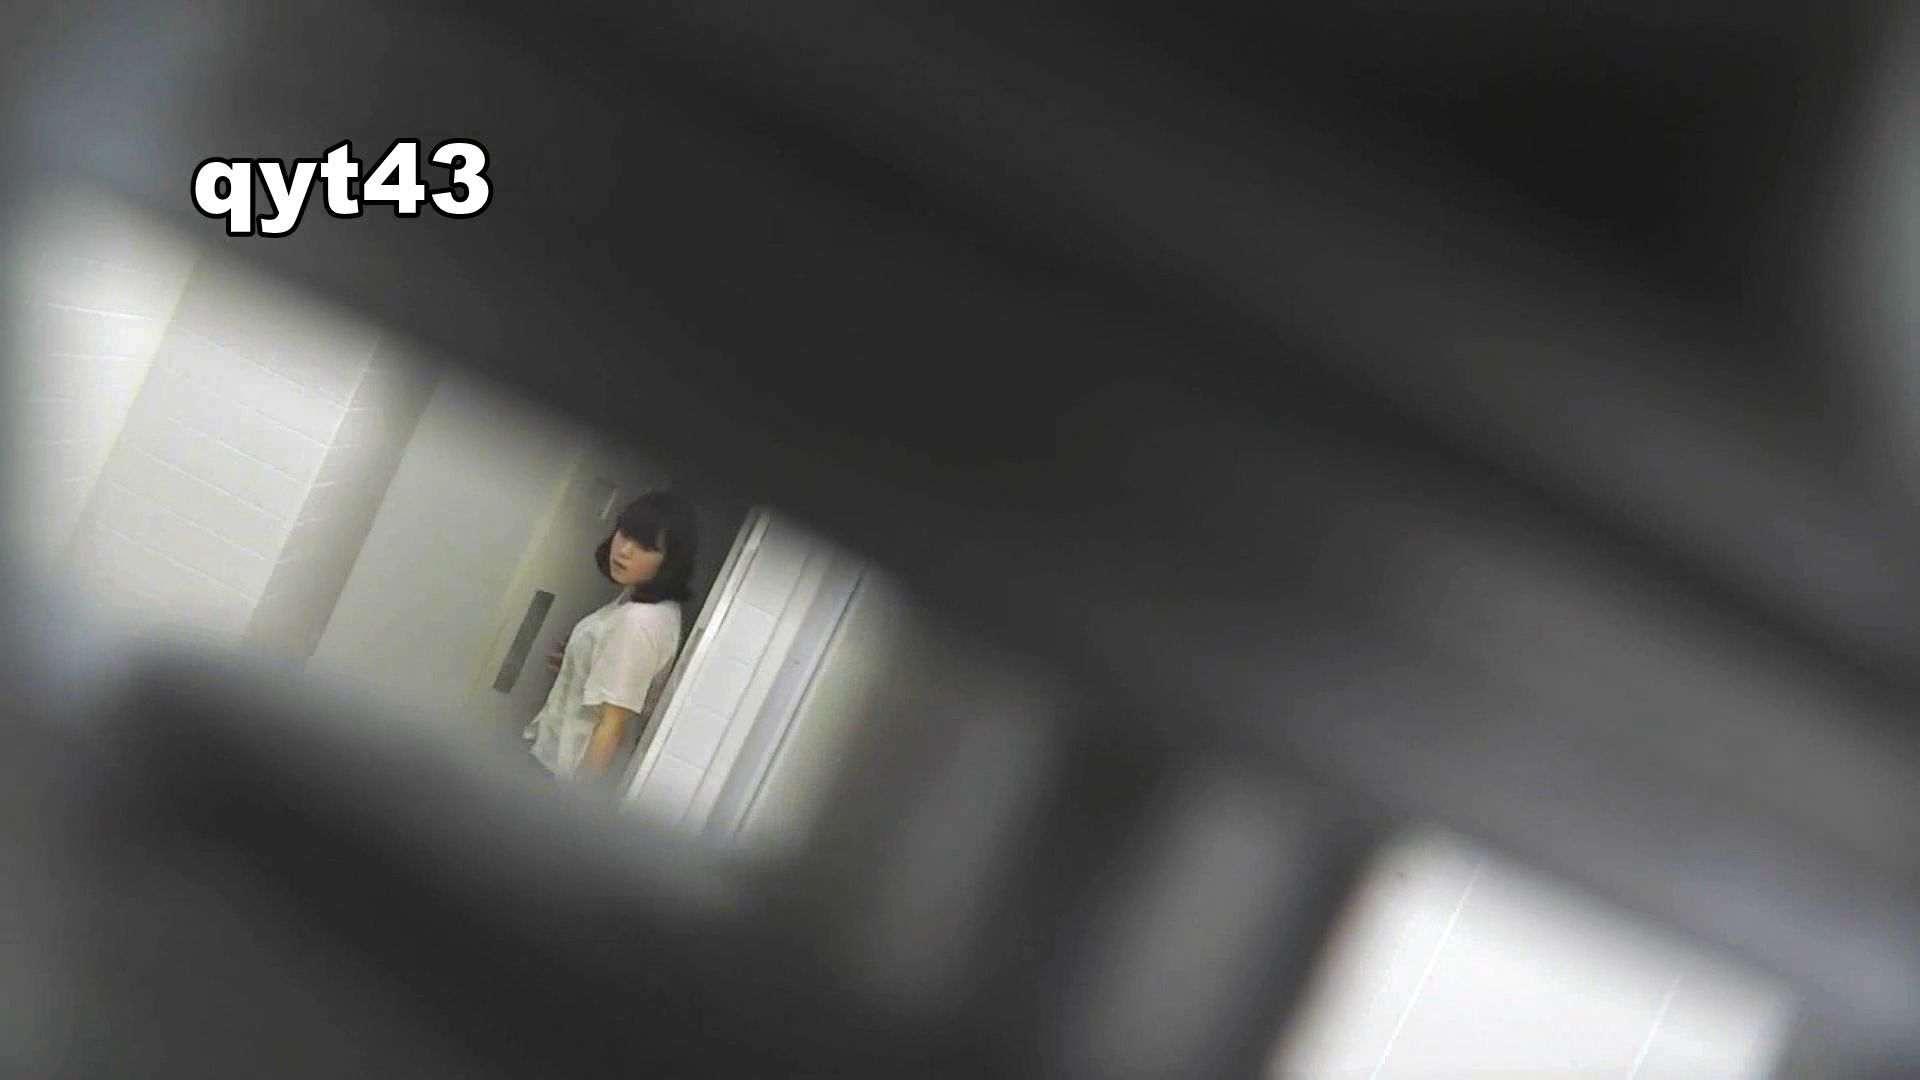 vol.42 命がけ潜伏洗面所! ちょろっとさん 洗面所 | 独身エッチOL  72pic 69